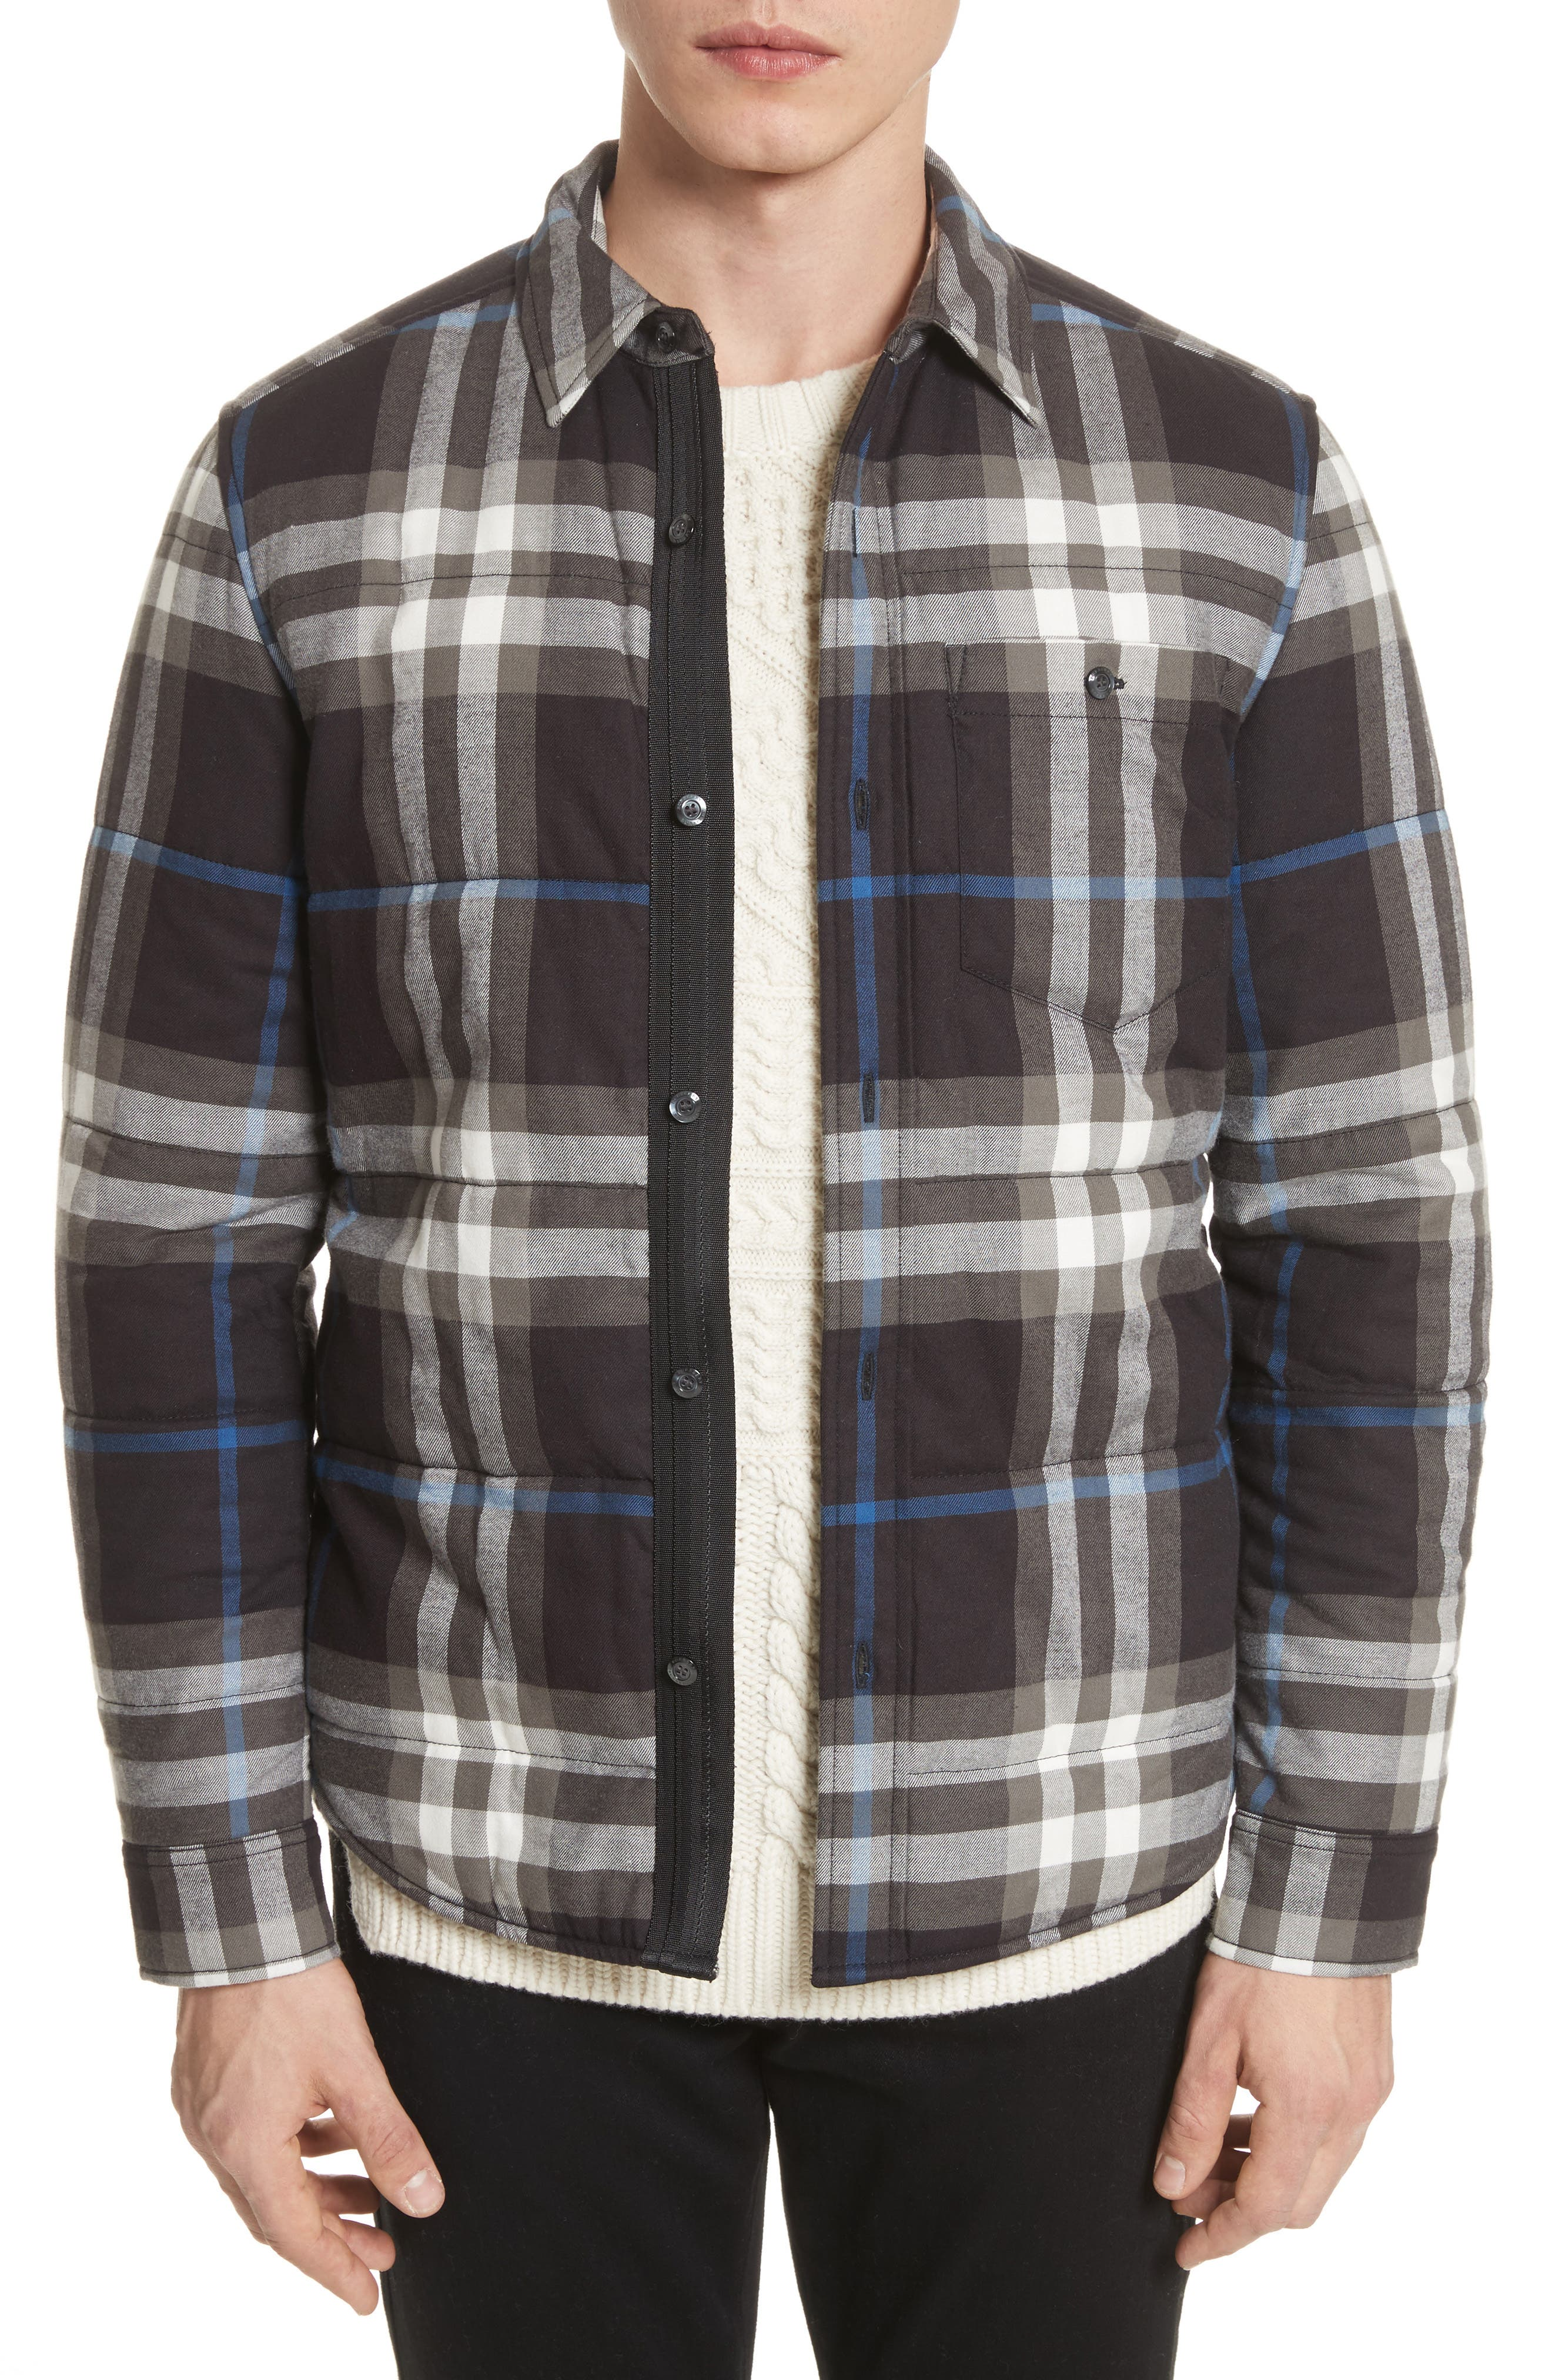 Walsden Plaid Flannel Shirt Jacket,                         Main,                         color, 001